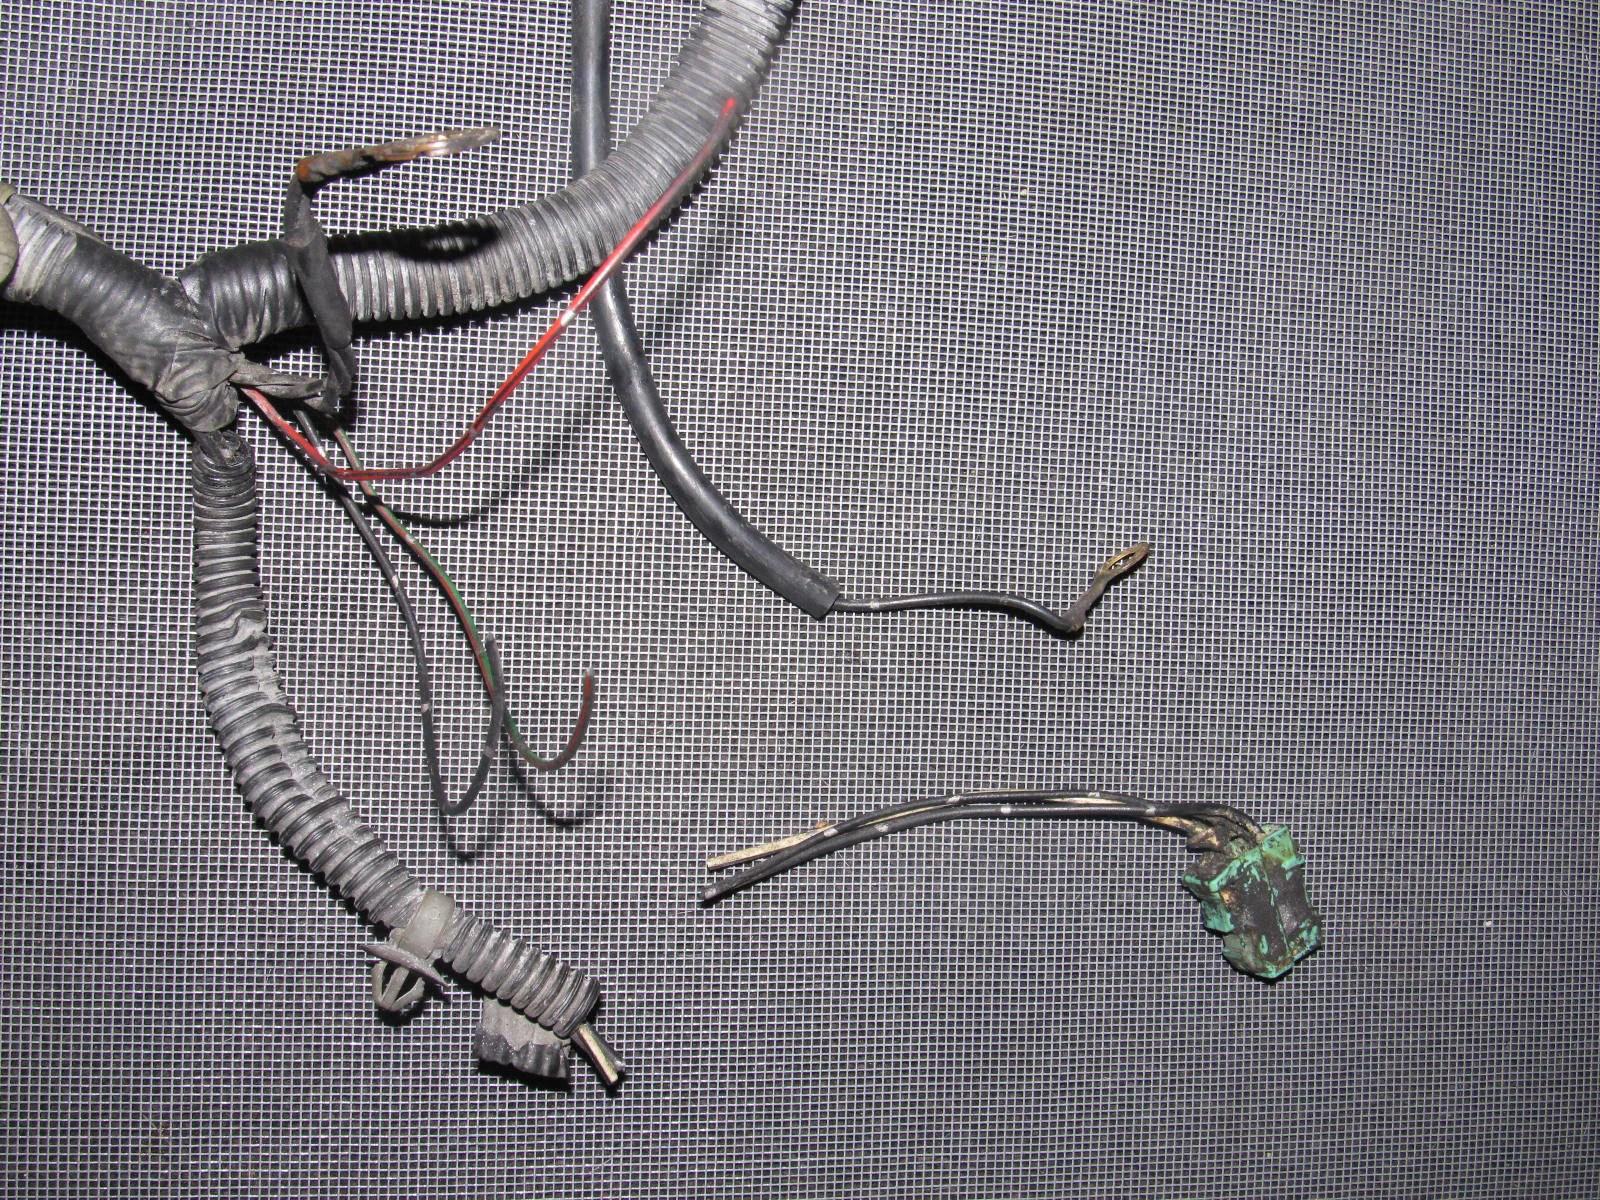 medium resolution of  96 97 98 99 00 honda civic oem headlight harness